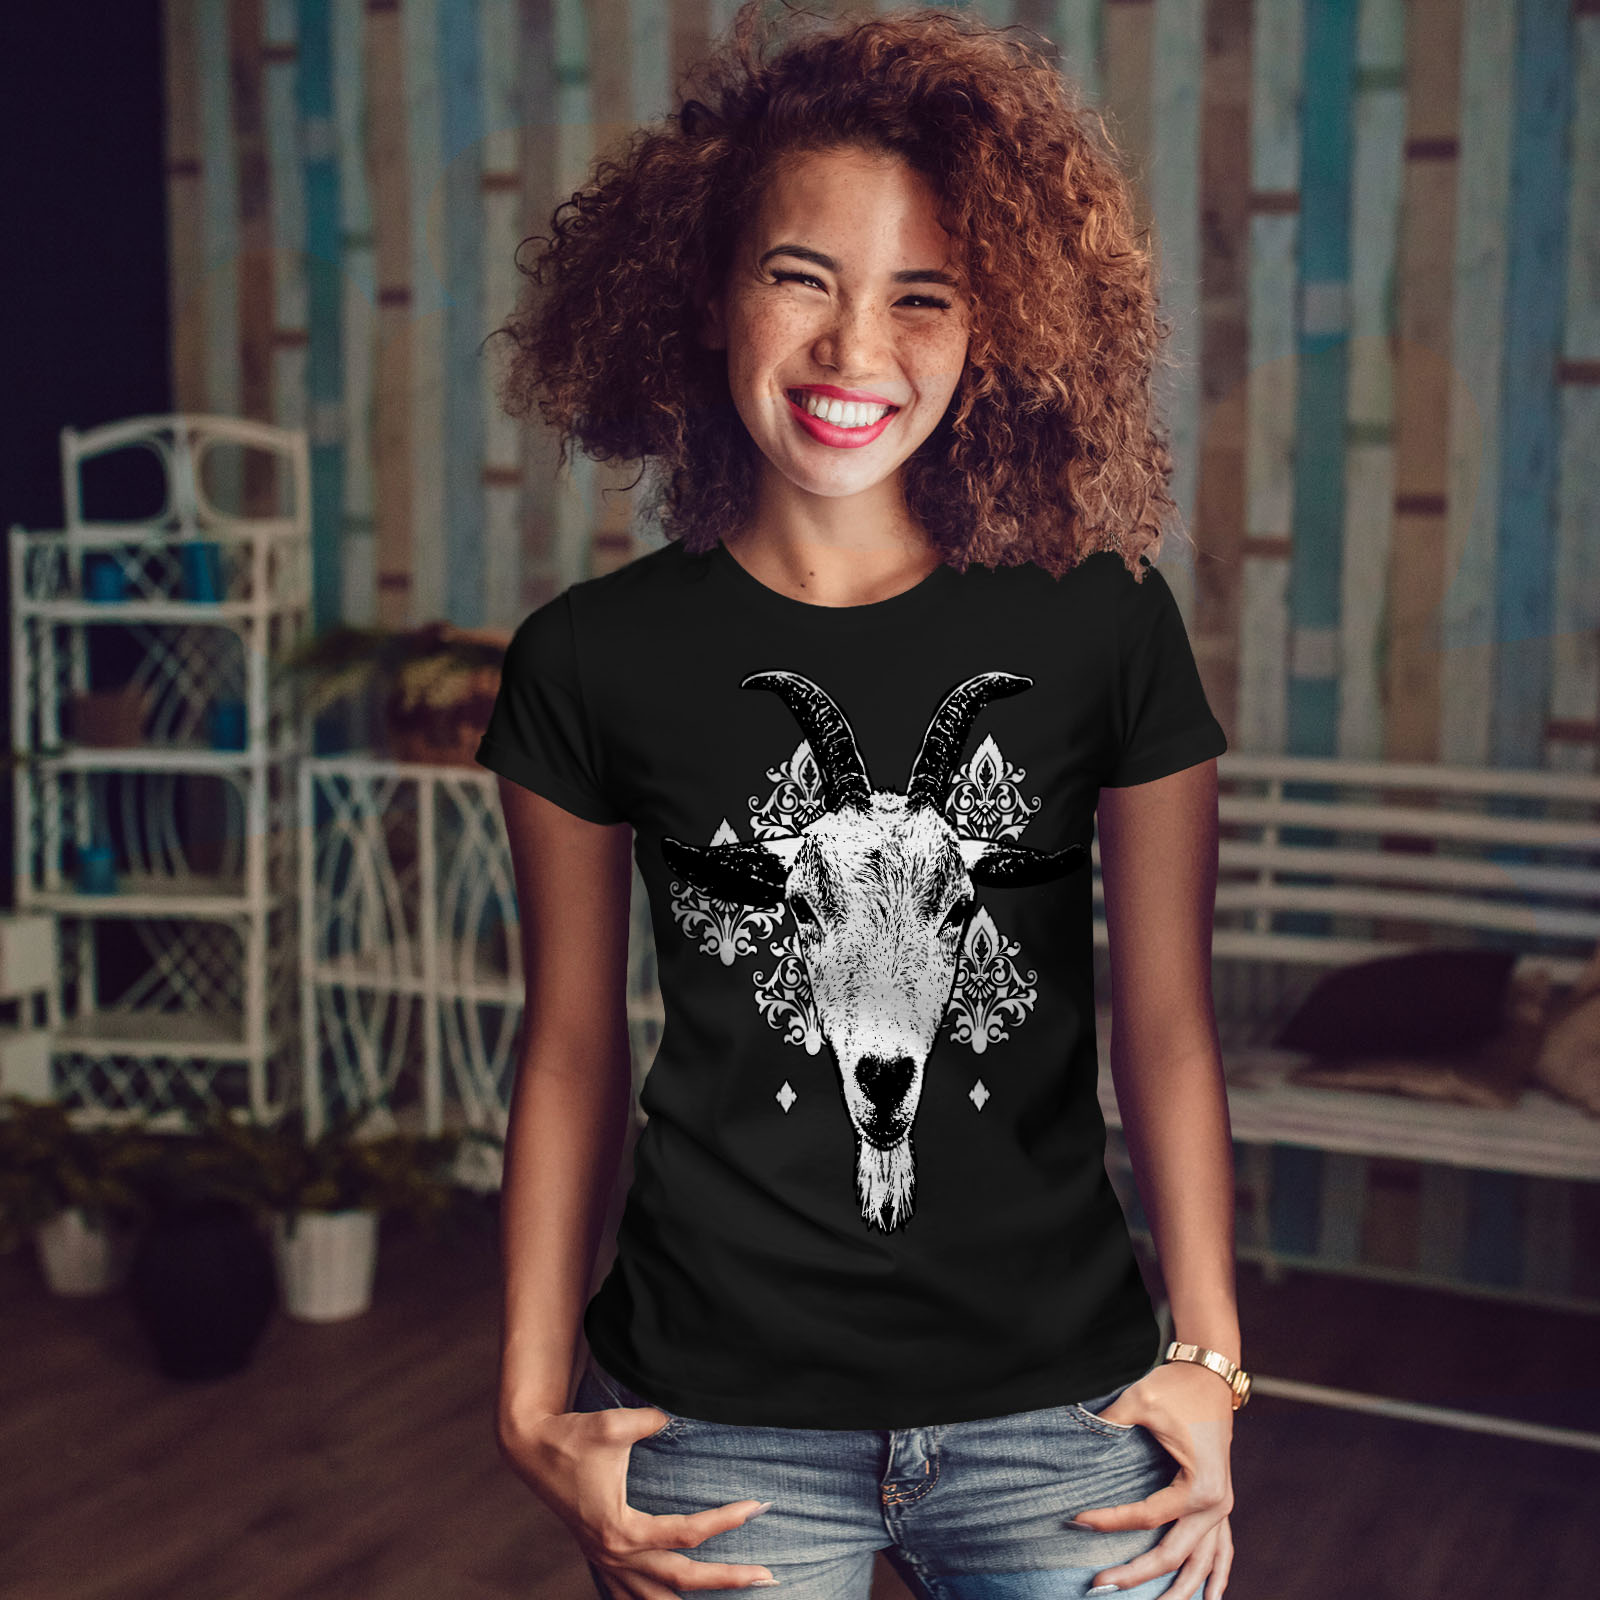 Goat Metal Creepy Animal Women T-shirt NEWWellcoda